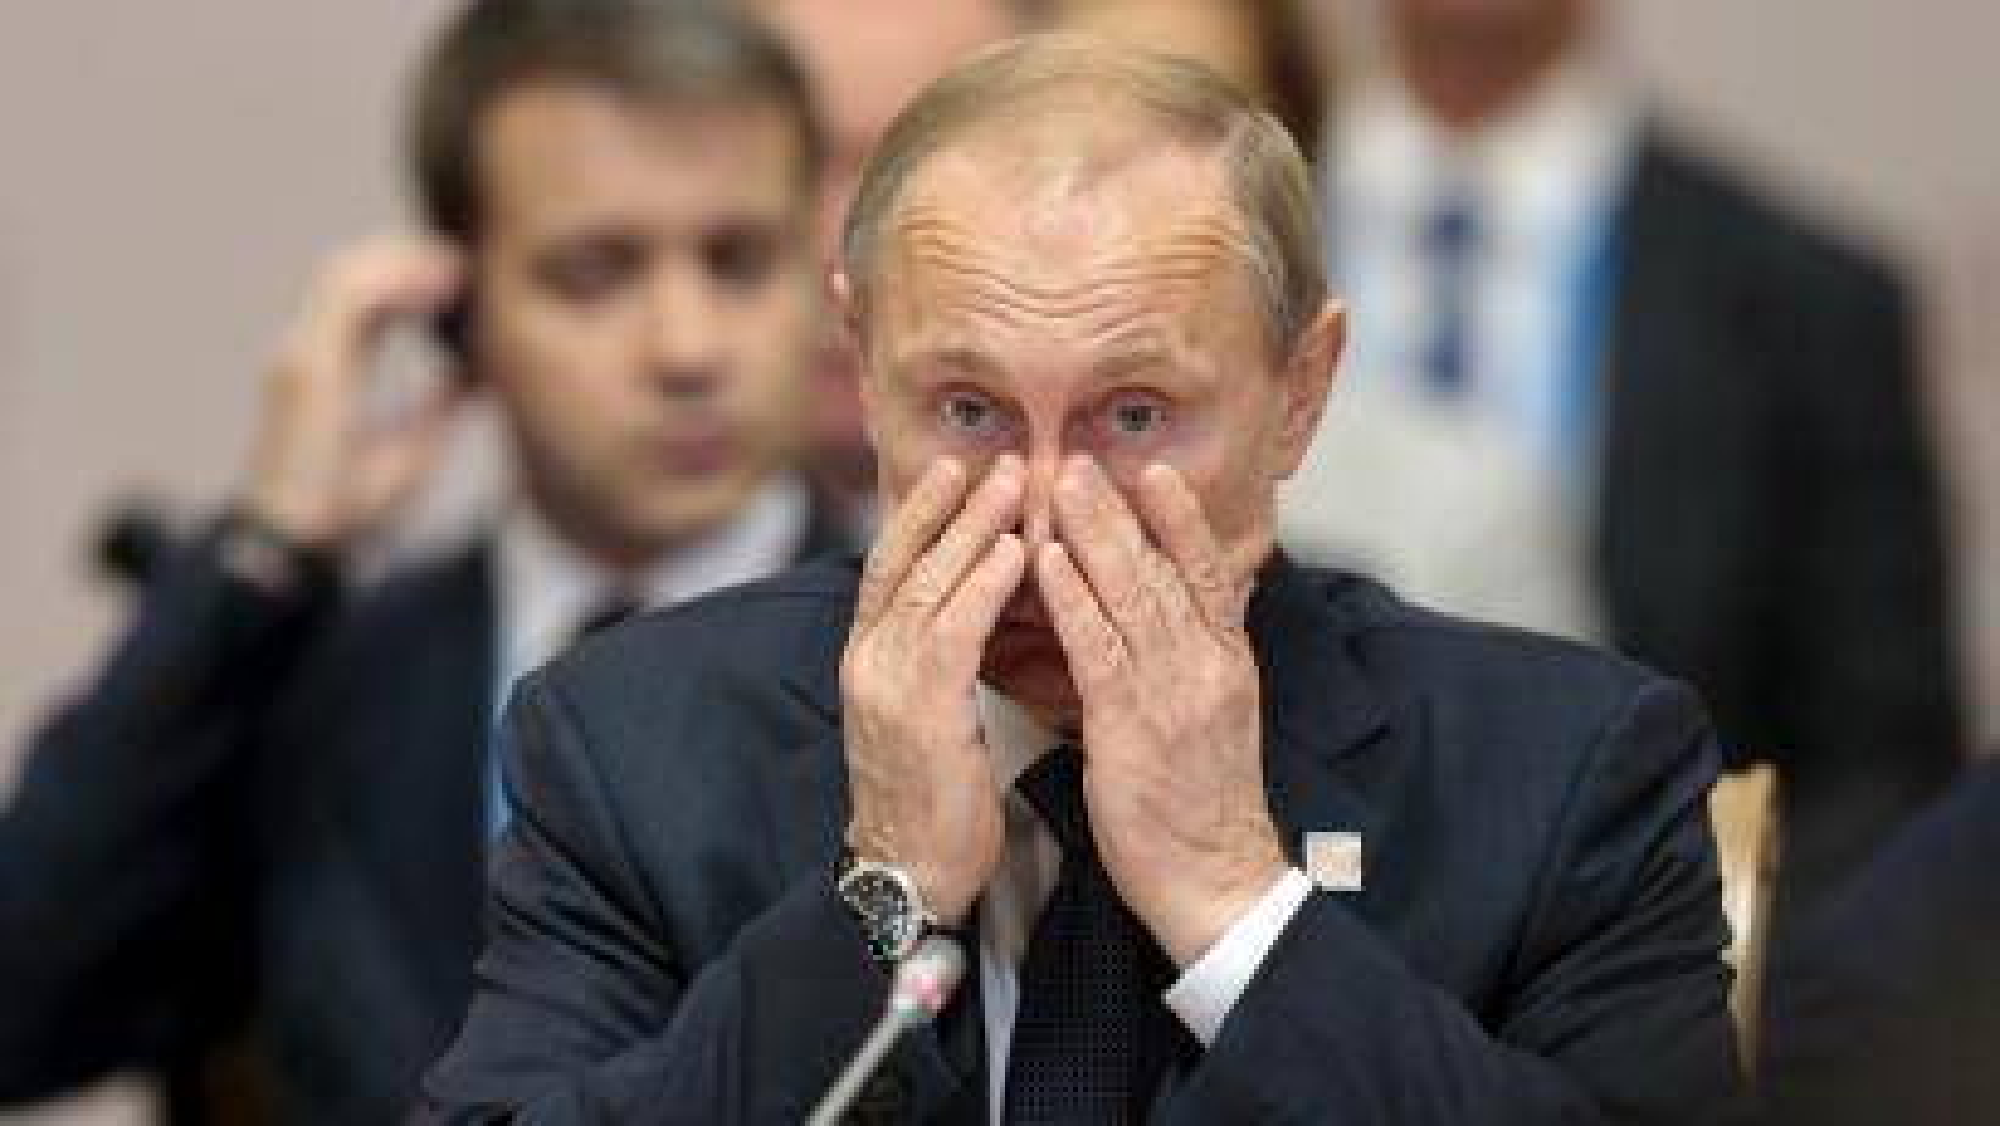 Russian President Vladimir Putin gestures during the BRICS Summit in Ufa, Russia, July 9, 2015.